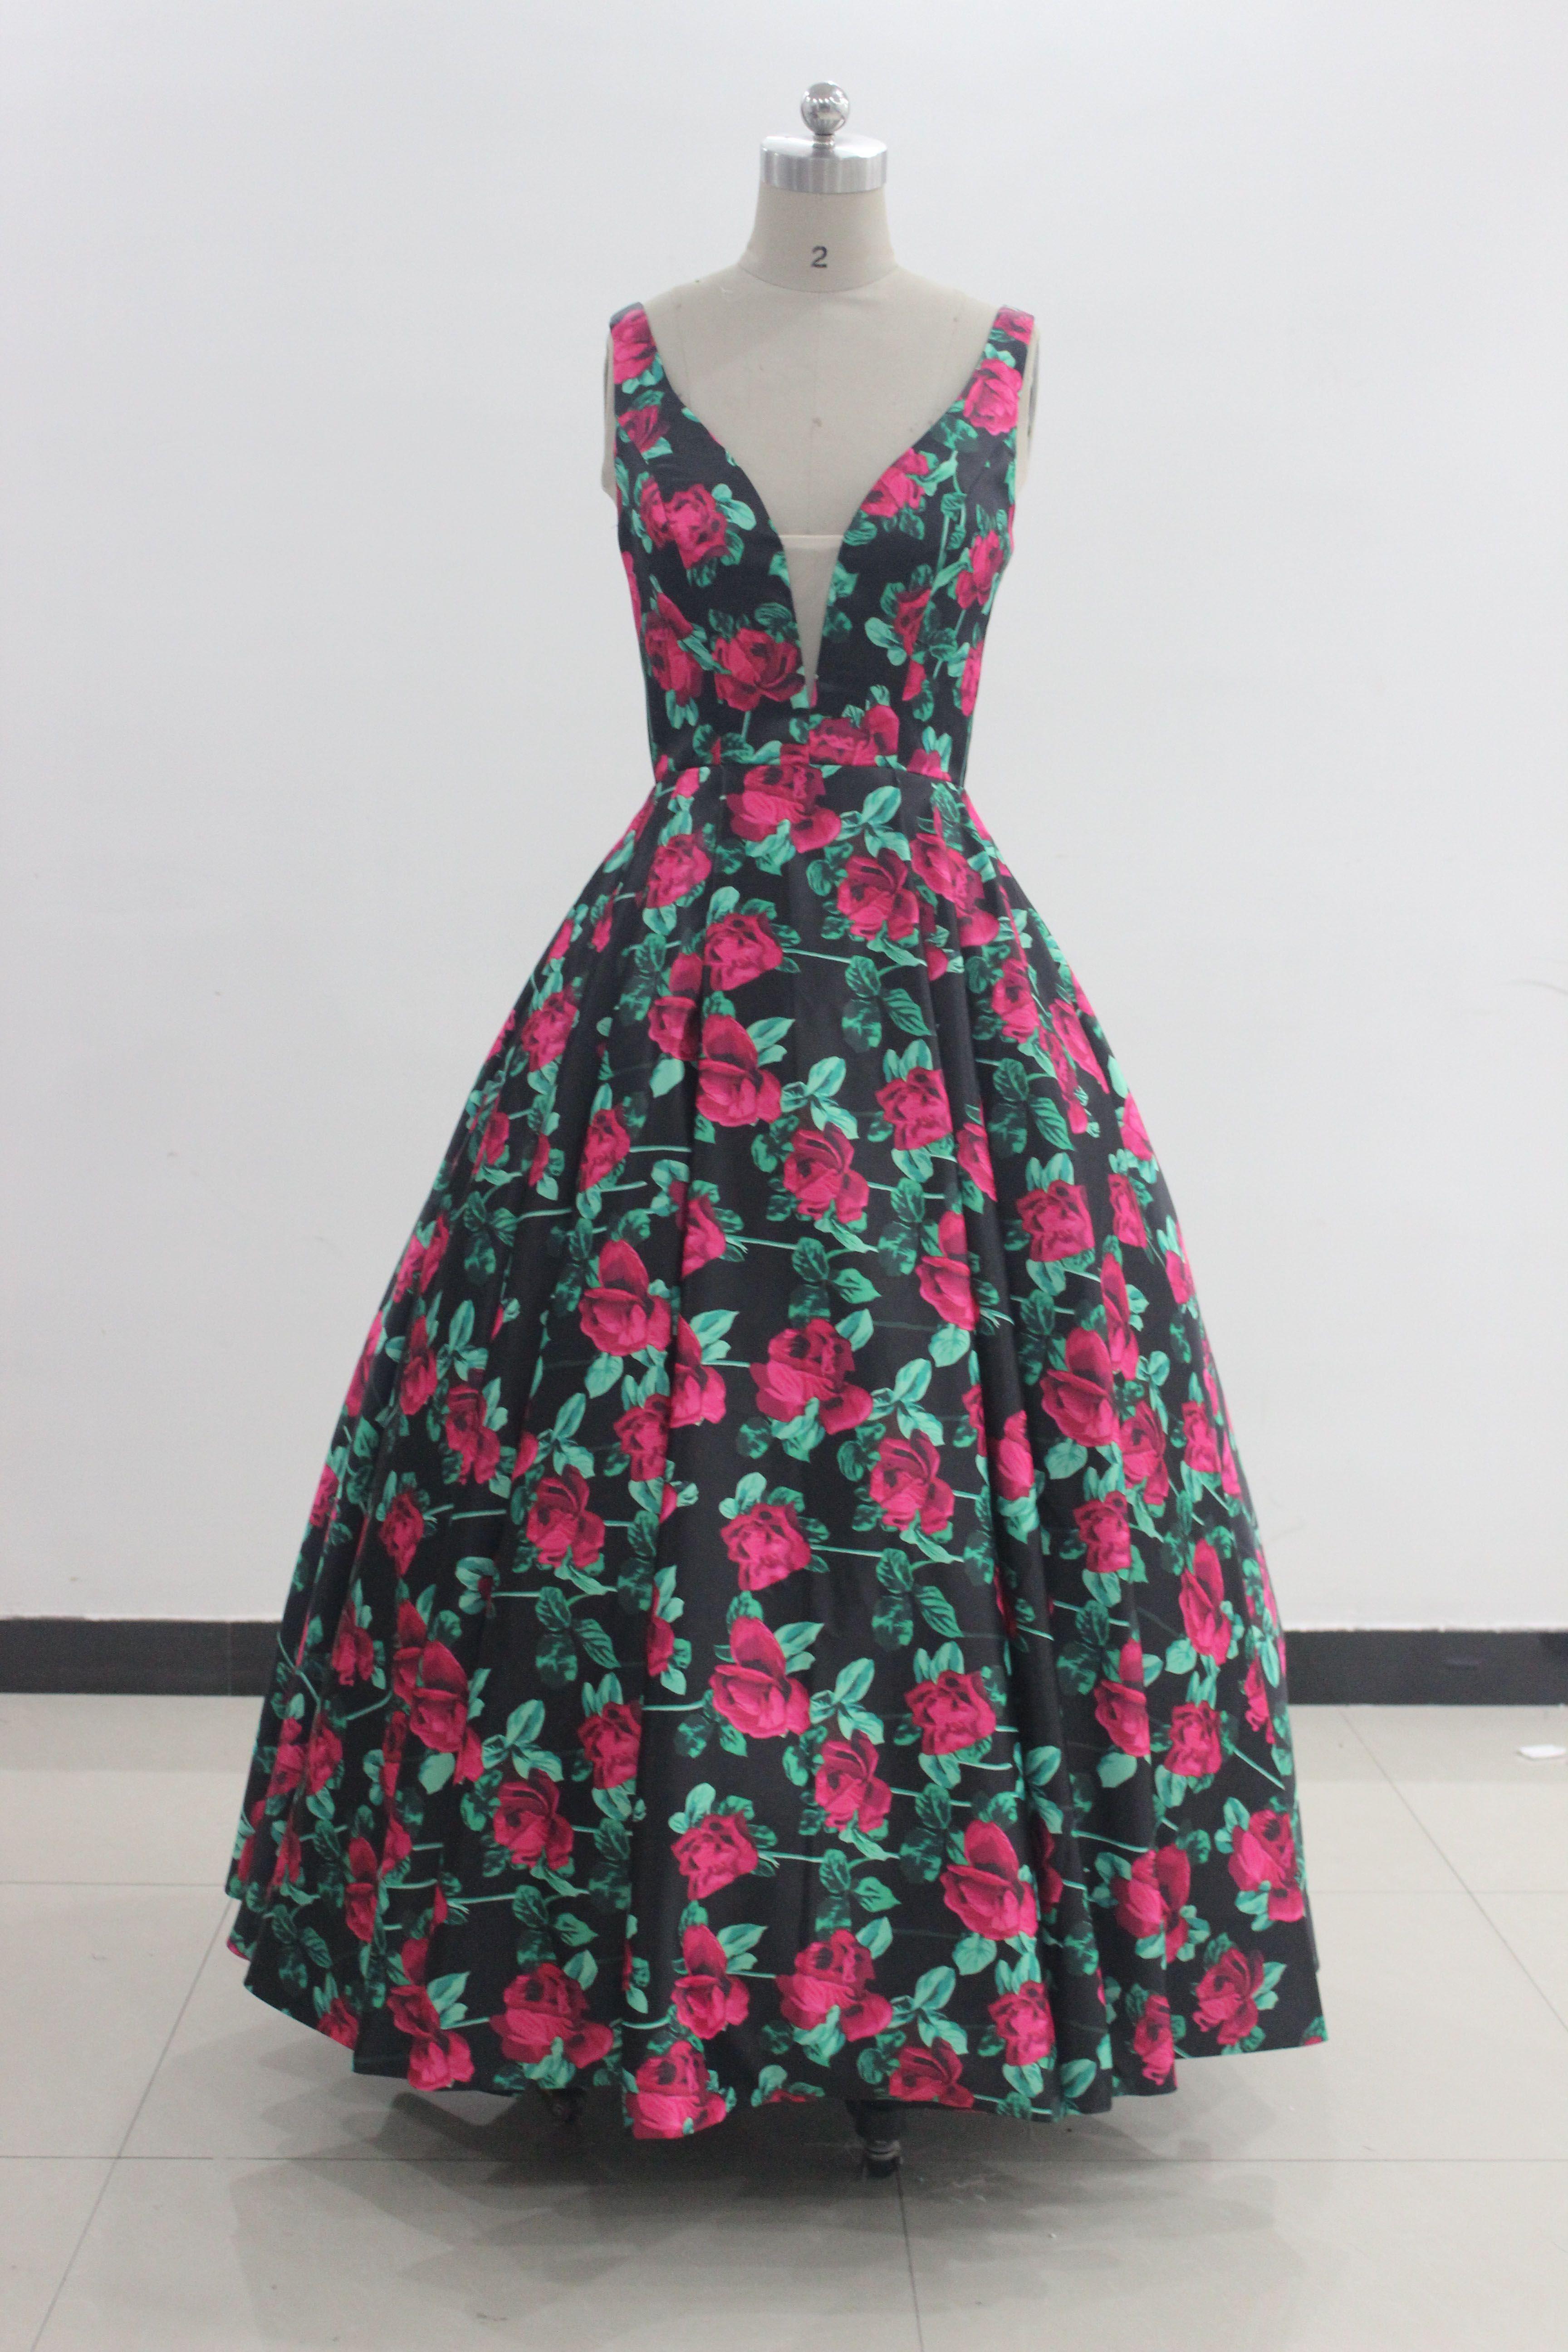 Zq067 2017 New Arrival Floral Print Prom Dress V Neck Open Back ...